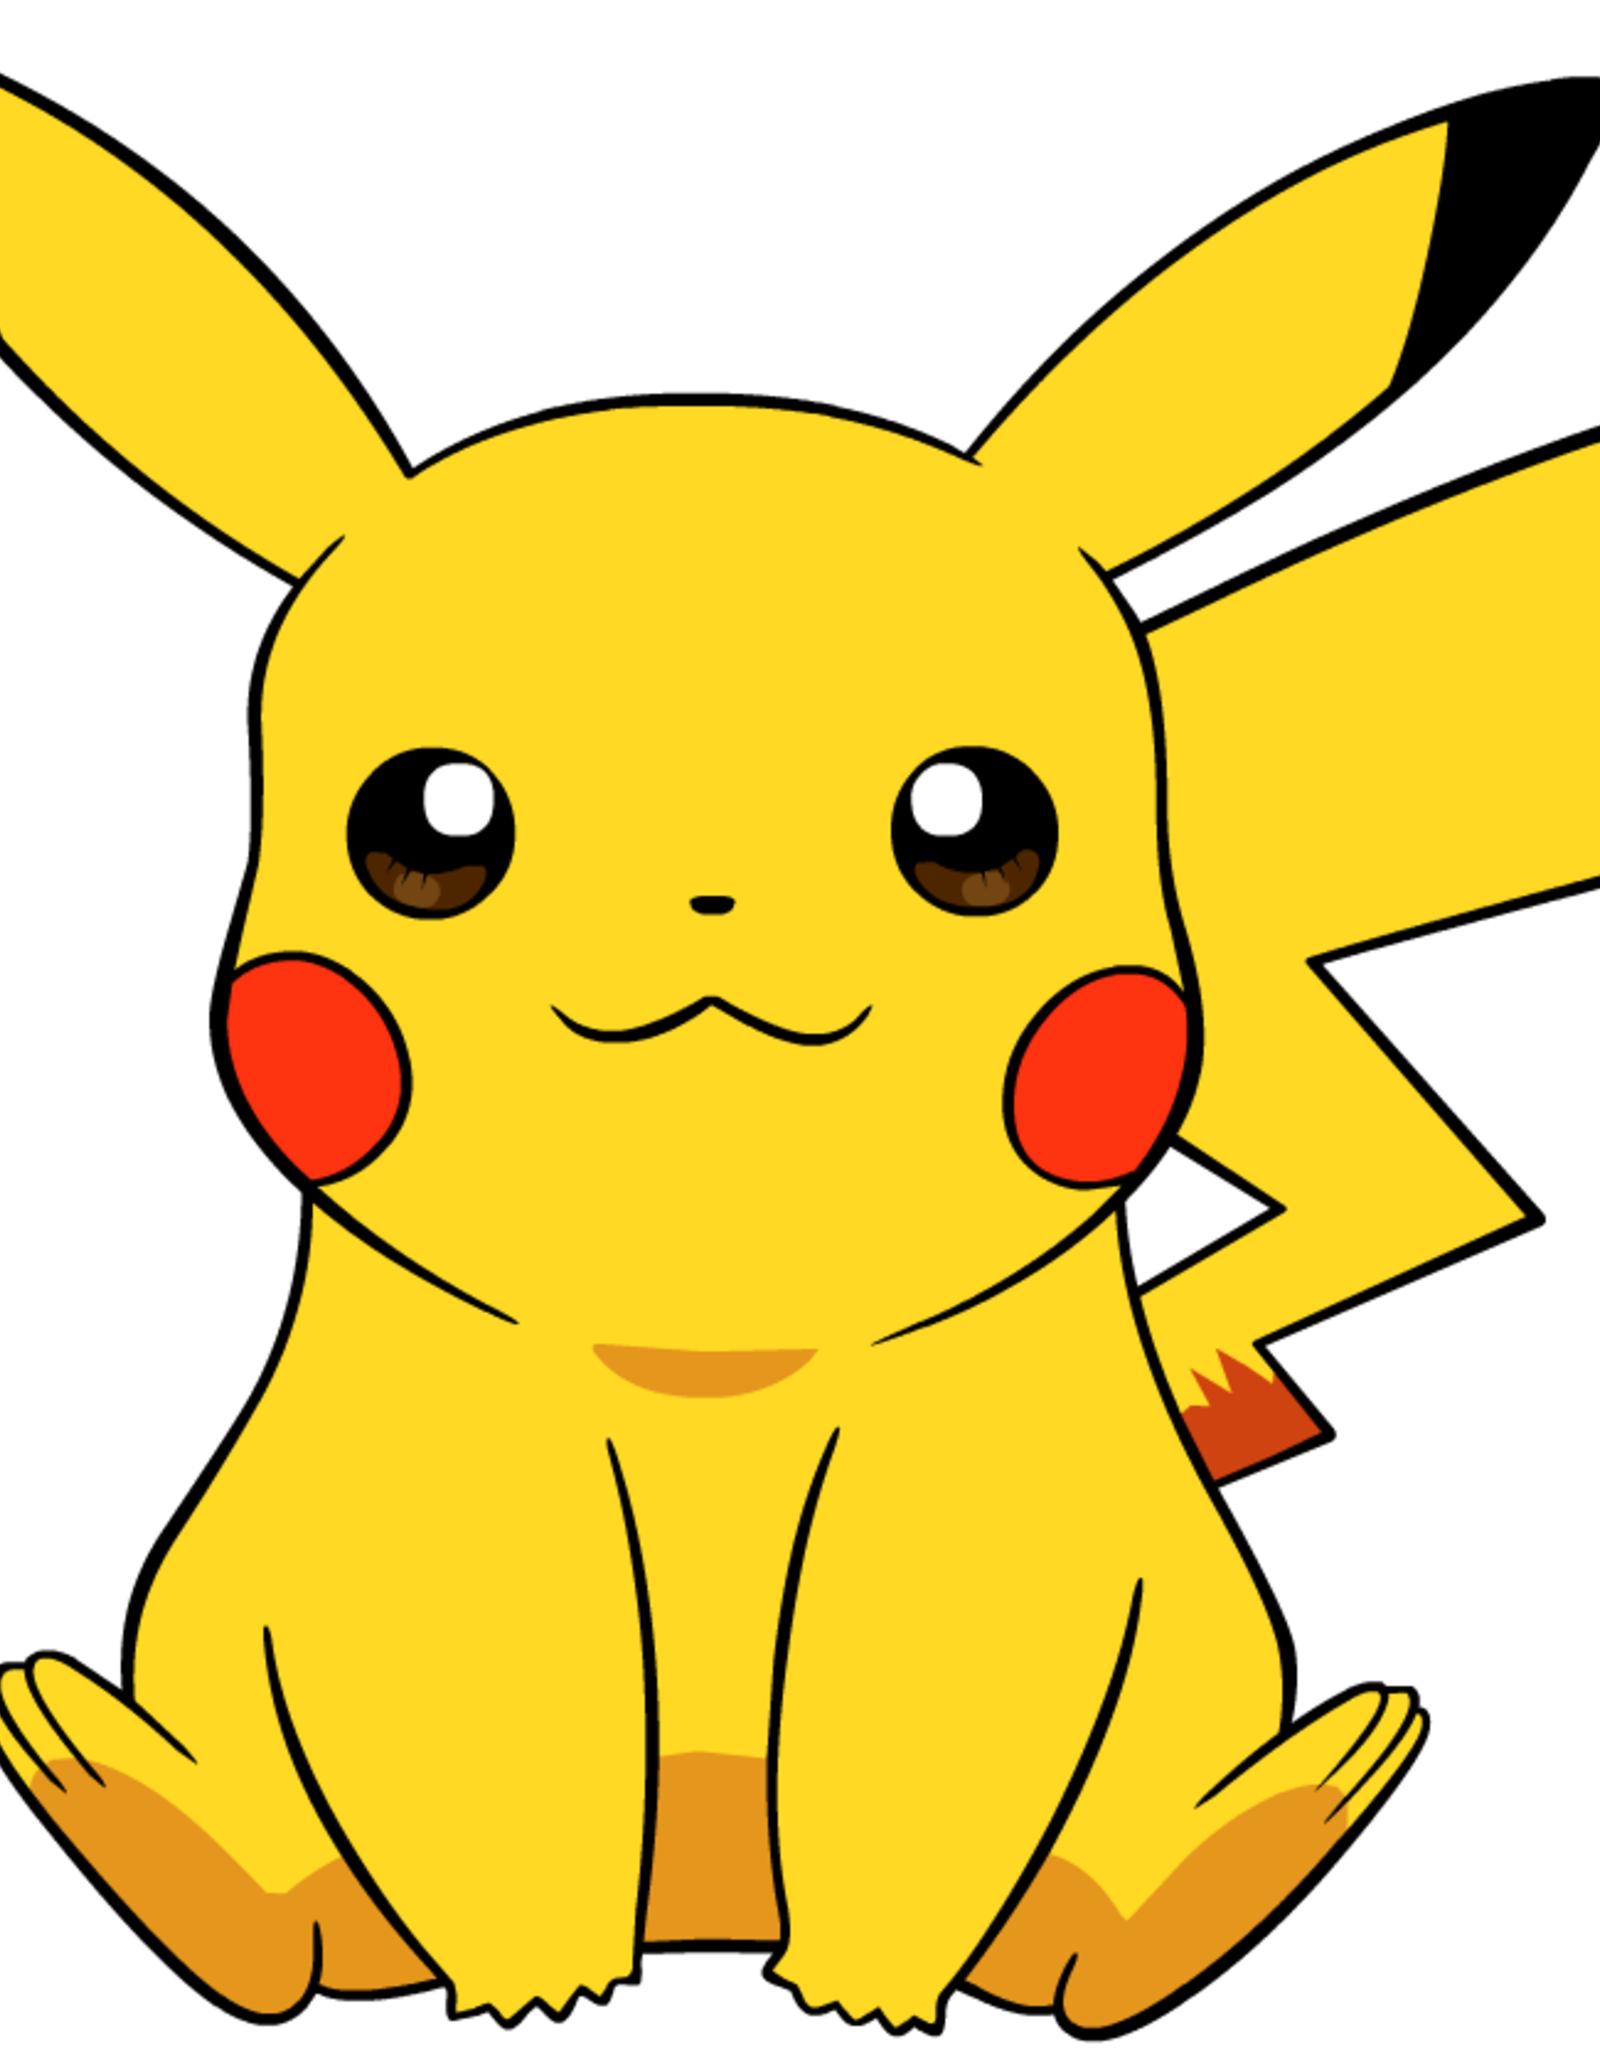 FTLA Art Kit: Painting Acrylic Pikachu